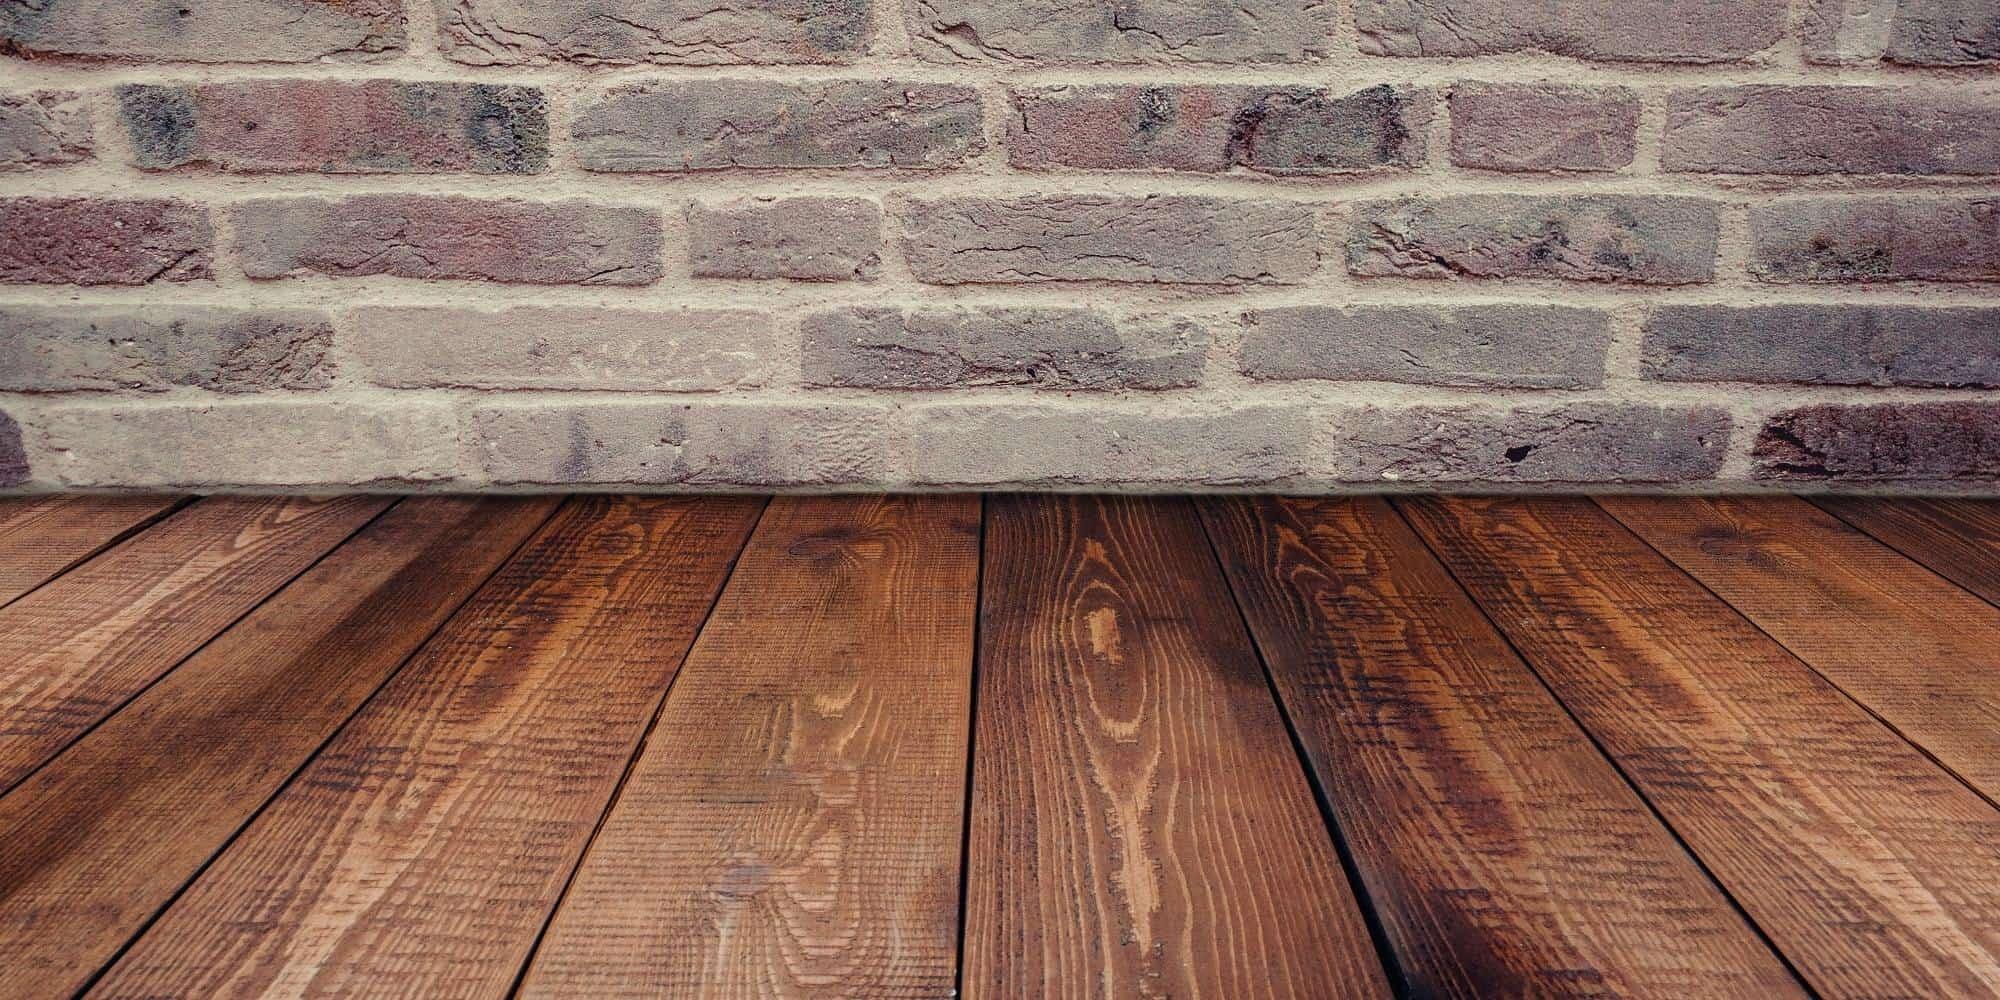 Black and brown hardwood flooring